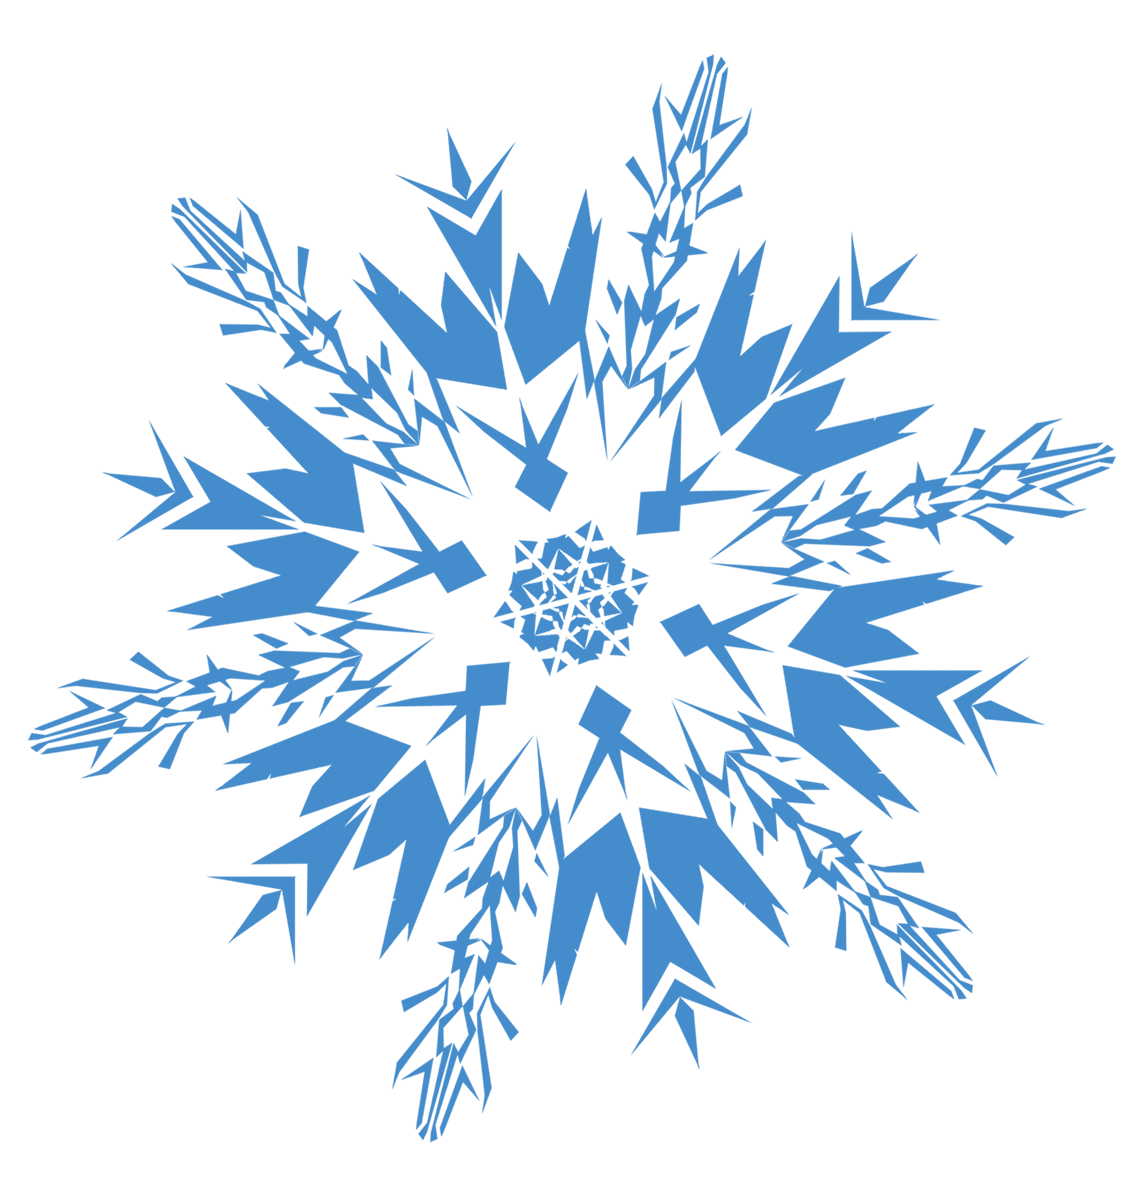 Frozen Snowflakes | Free download best Frozen Snowflakes on ... image transparent download